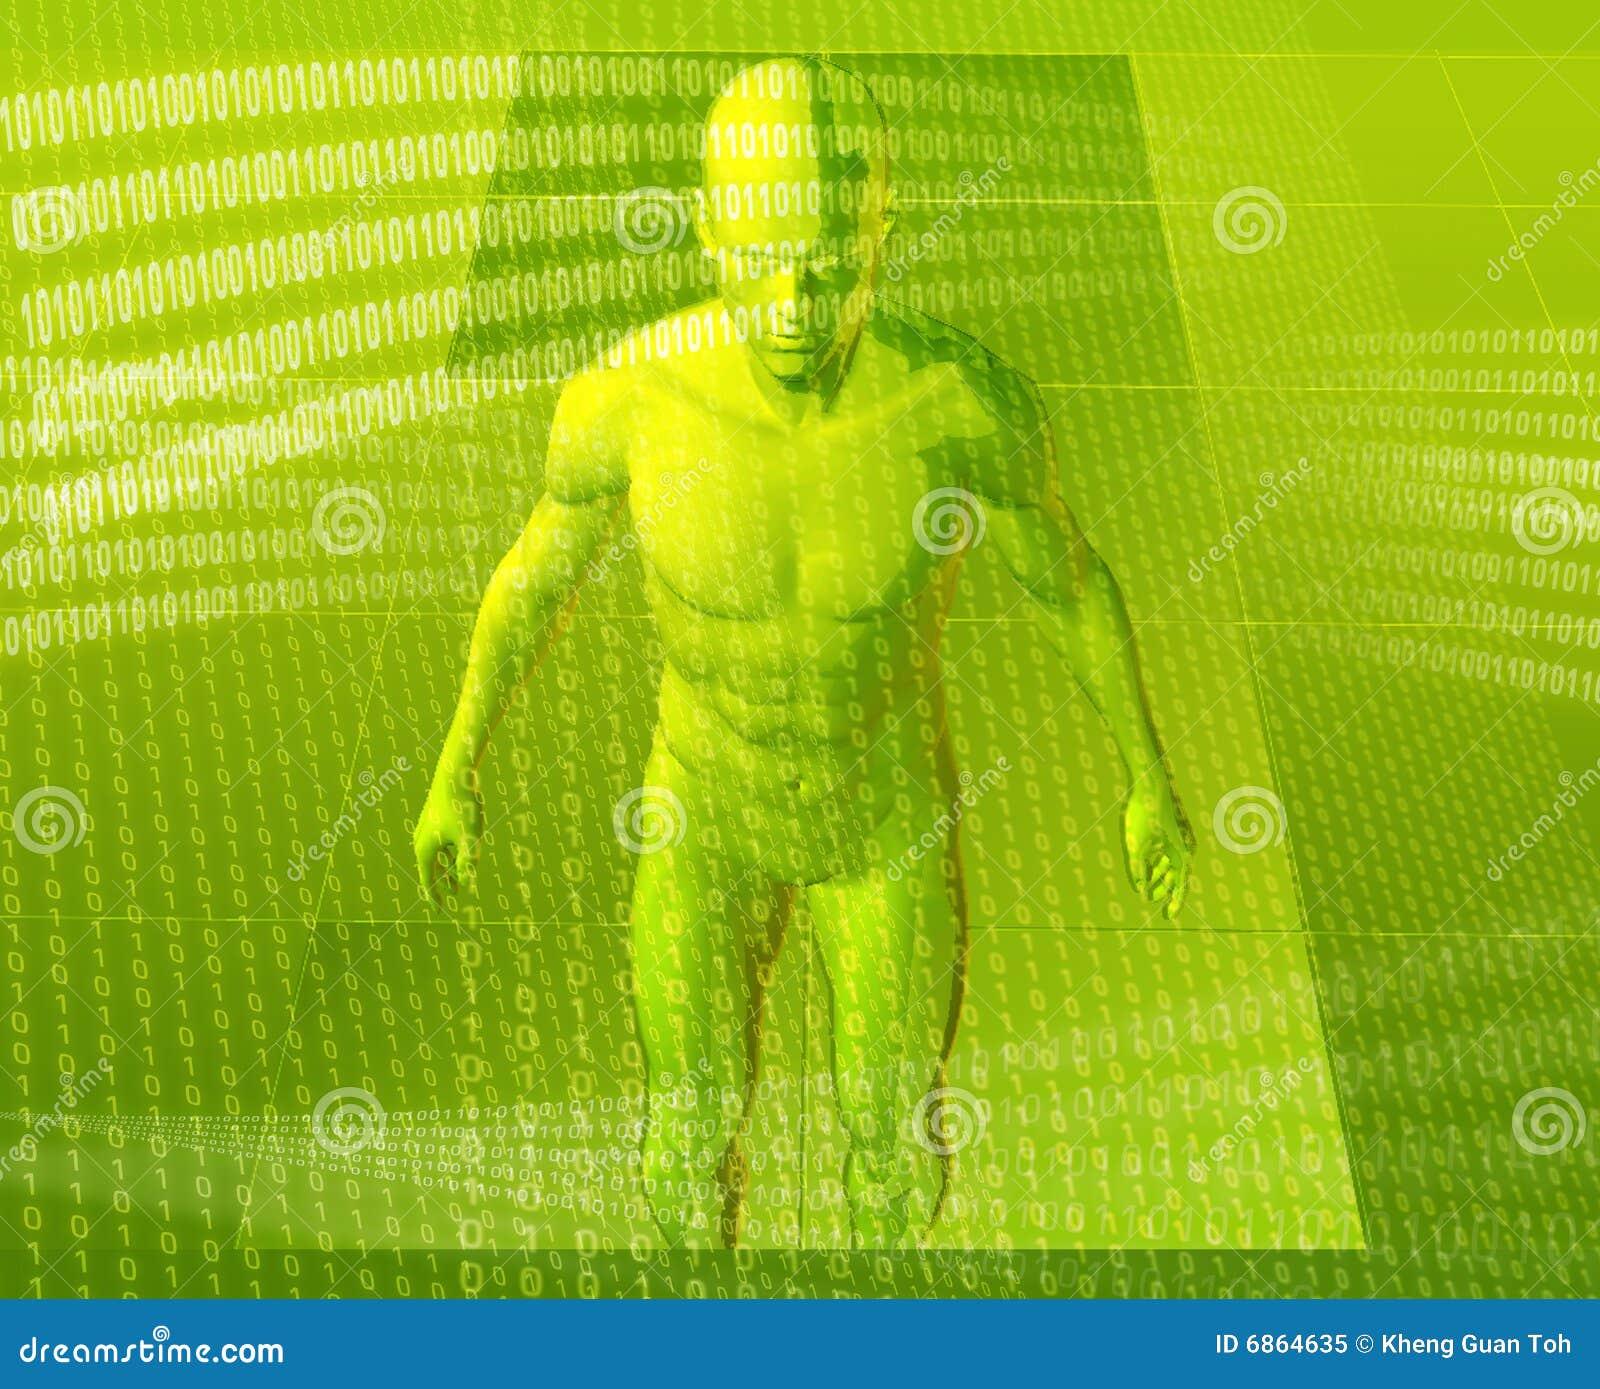 Avatar virtuel